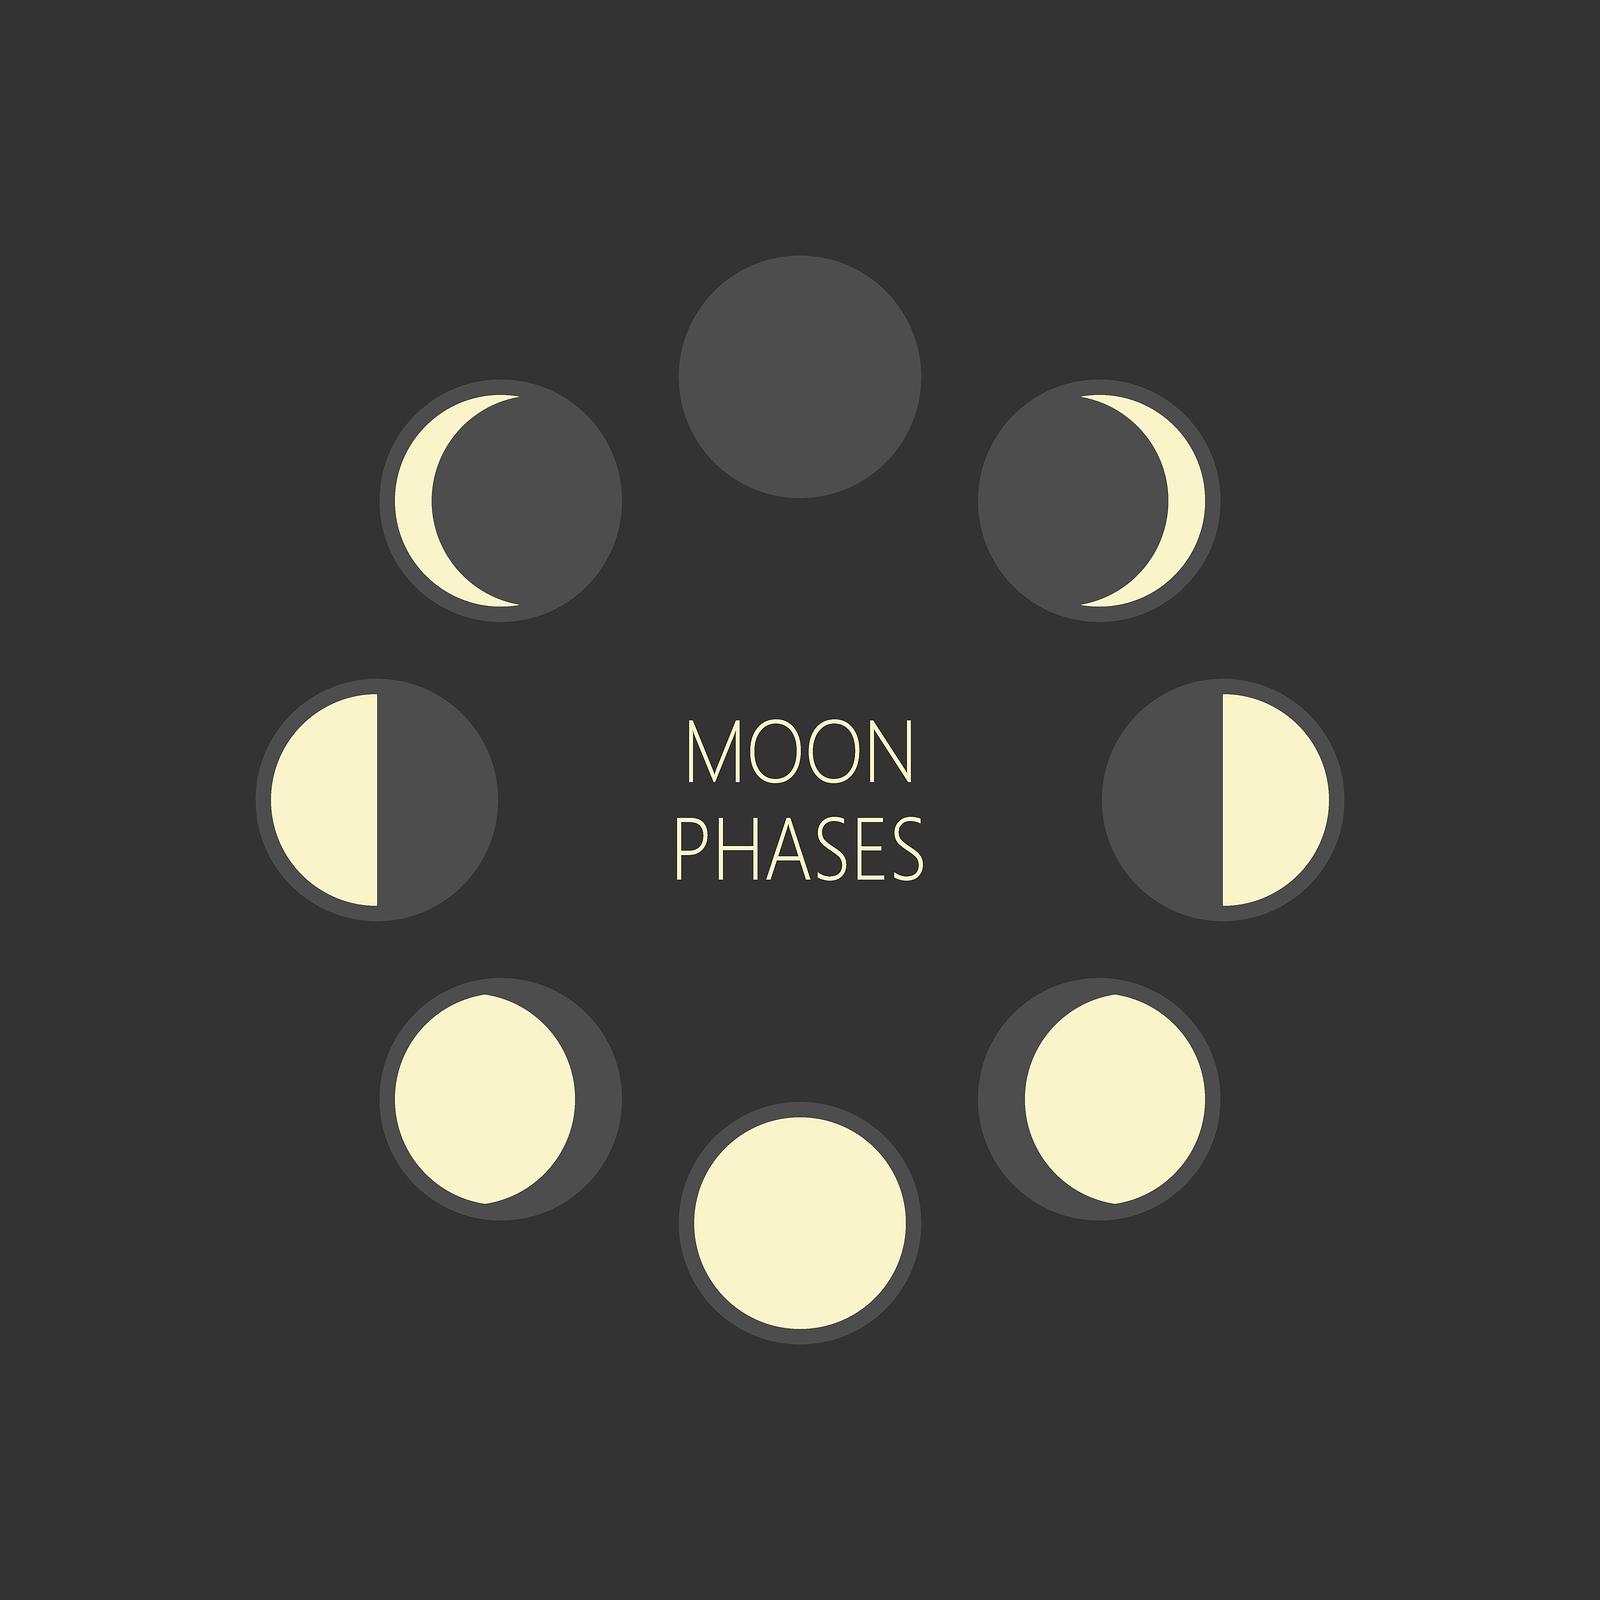 bigstock-Lunar-Phases-Round-Vector-Illu-262117867.jpg